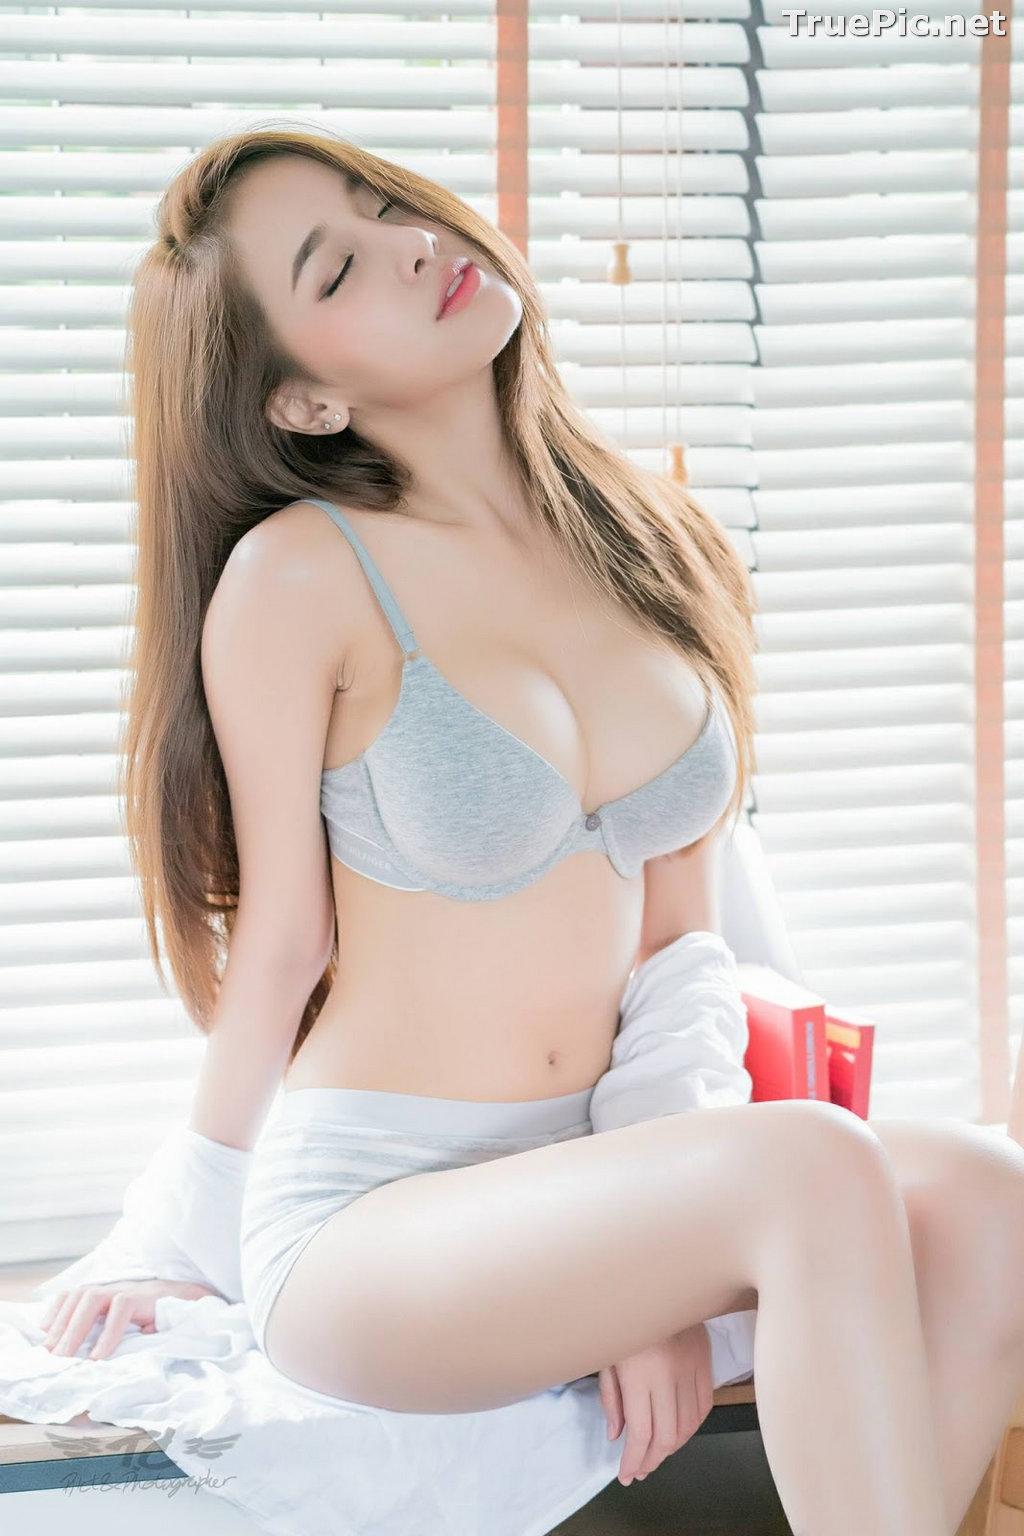 Image Thailand Sexy Model - Pichana Yoosuk - Waiting For Love - TruePic.net - Picture-2